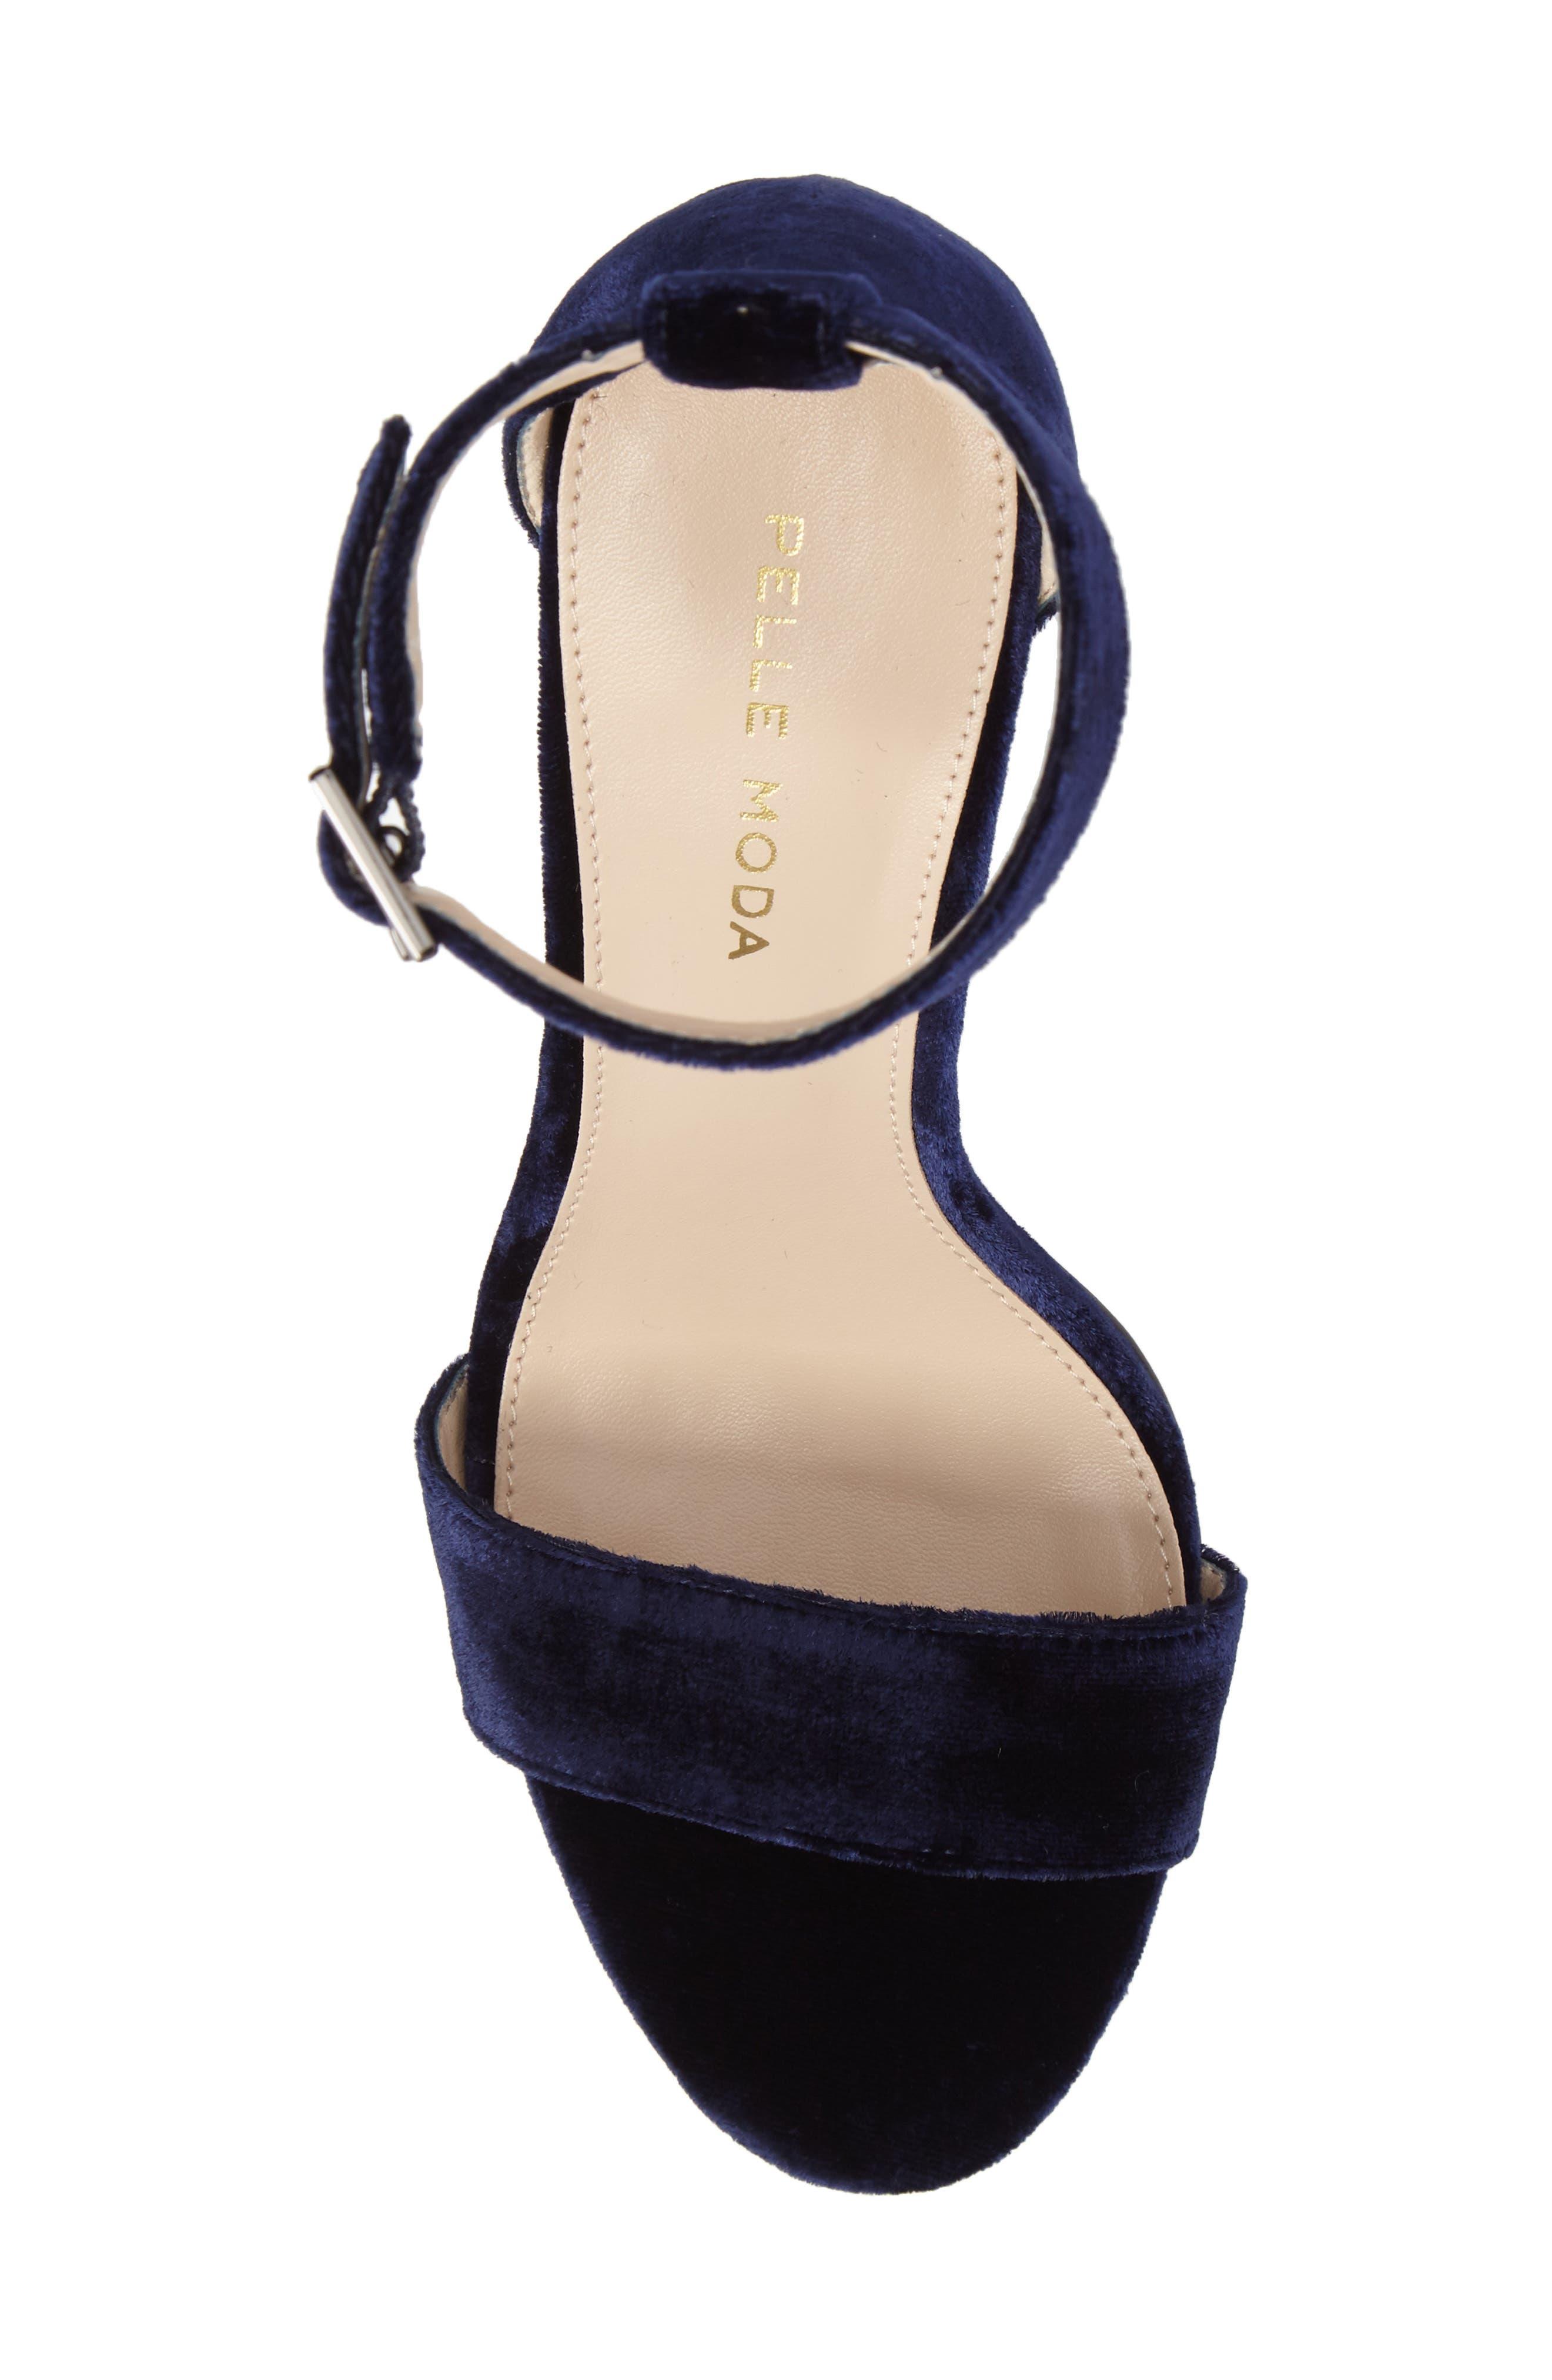 Bonnie Ankle Strap Sandal,                             Alternate thumbnail 5, color,                             Midnight